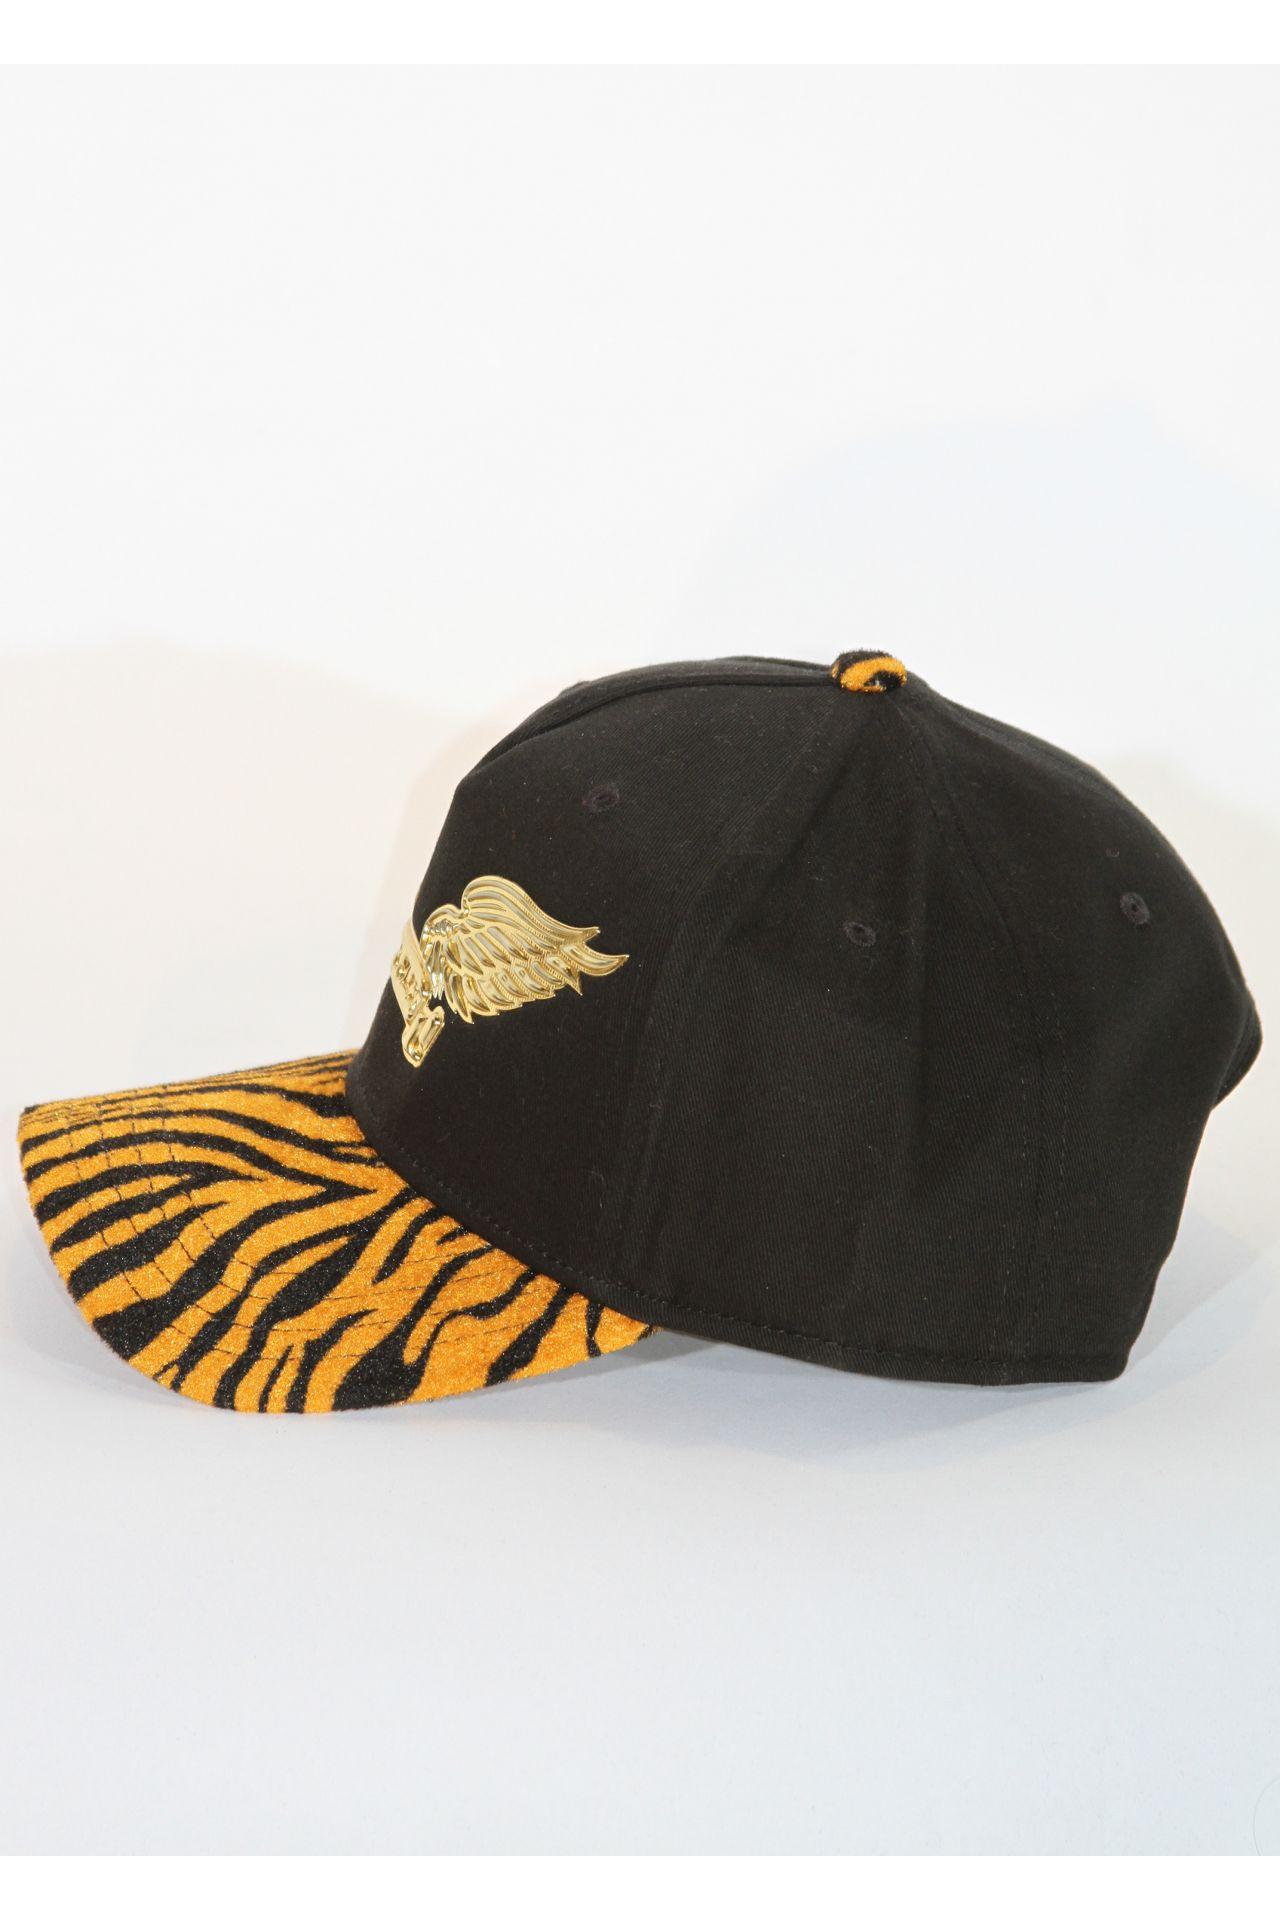 TIGER HAT IN BLACK